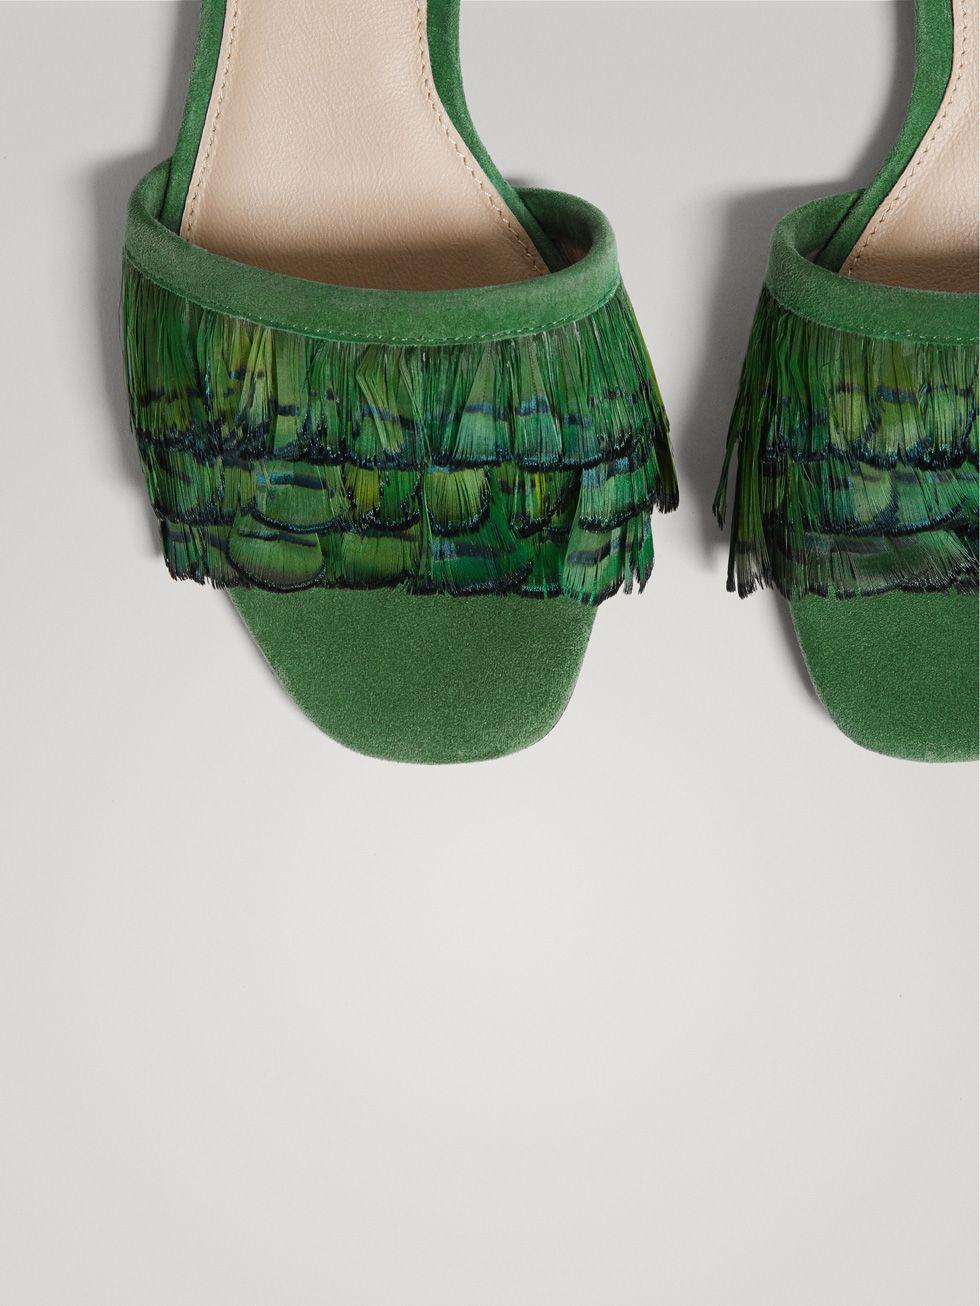 Verde Pluma Sandalia Massimo Mujer Dutti Piel EspañaShoes D29IEH